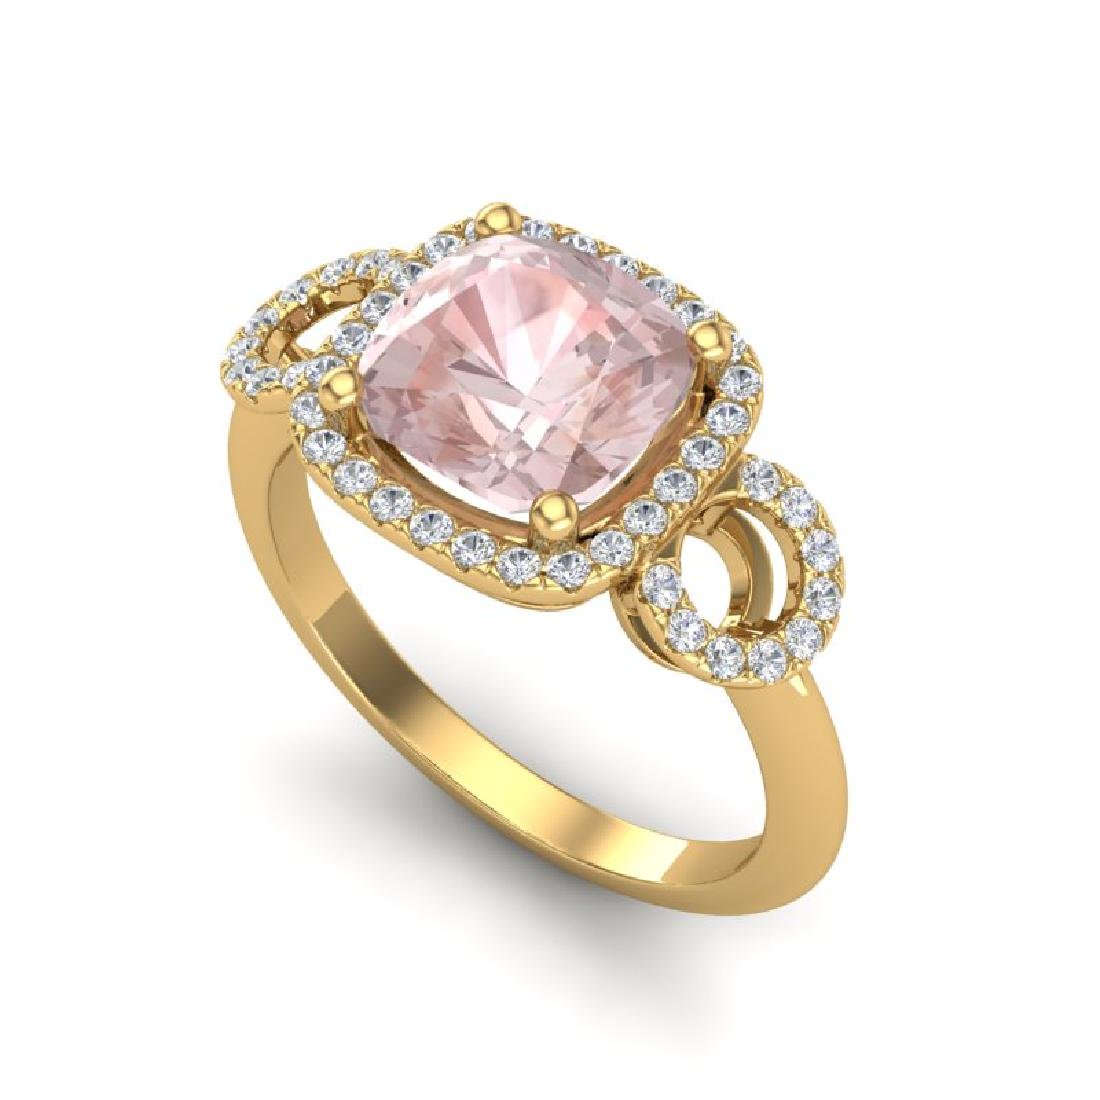 2.75 CTW Morganite & Micro VS/SI Diamond Ring 14K Rose - 2